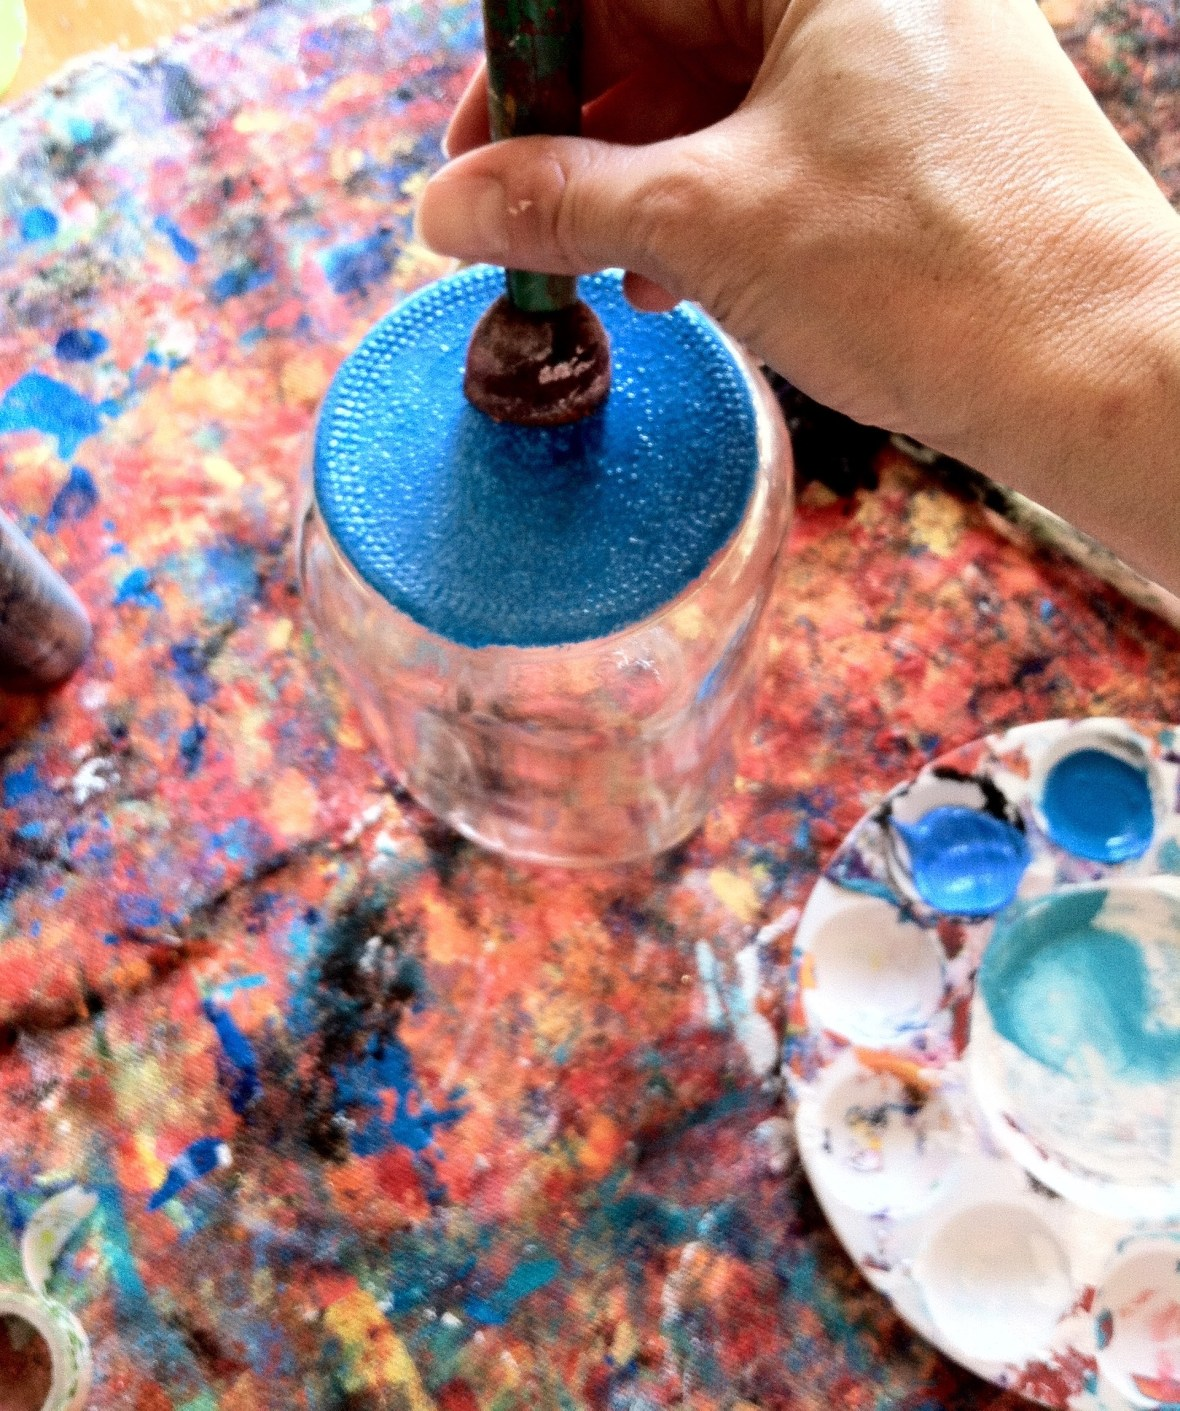 Painting bottom of jar